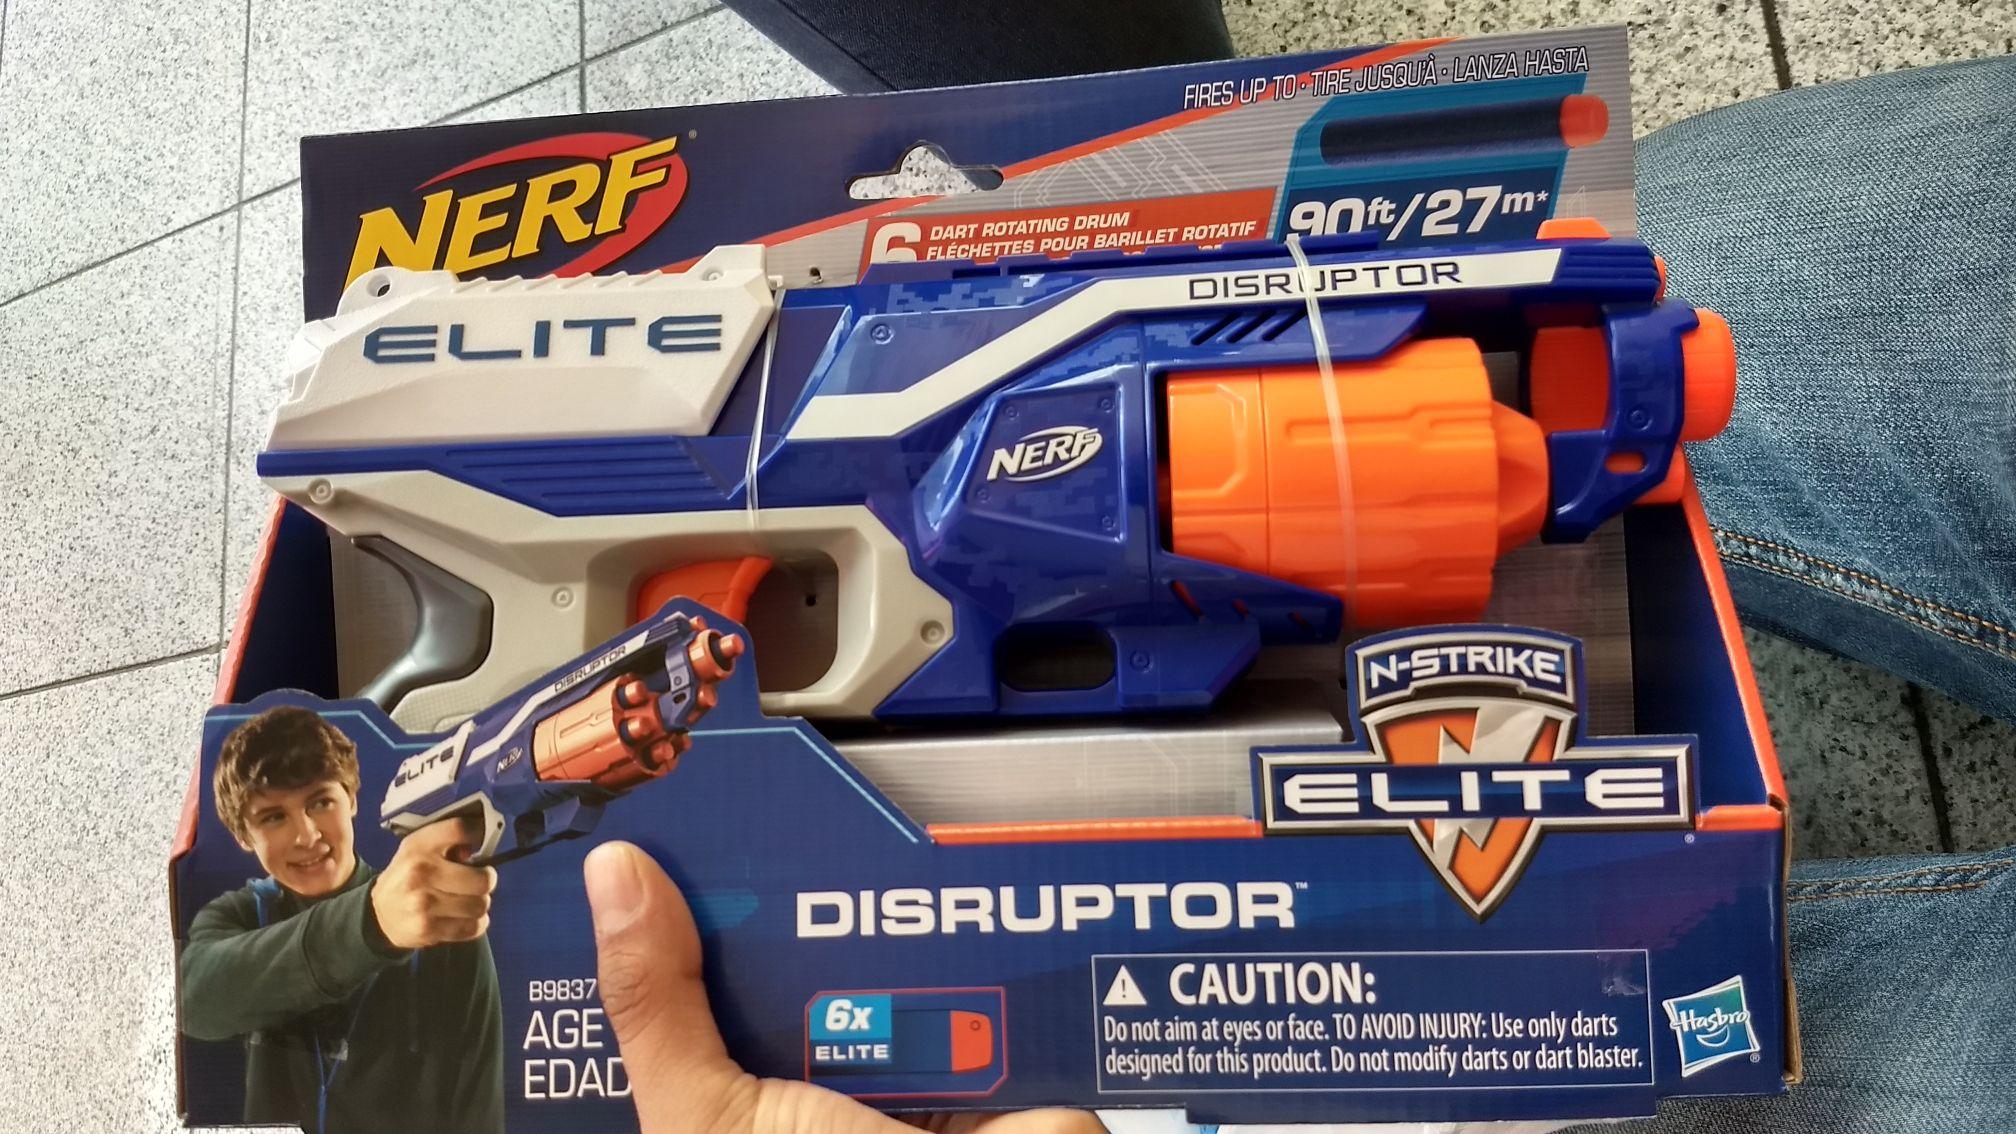 Lumen: Pistola Nerf y juguetes varios